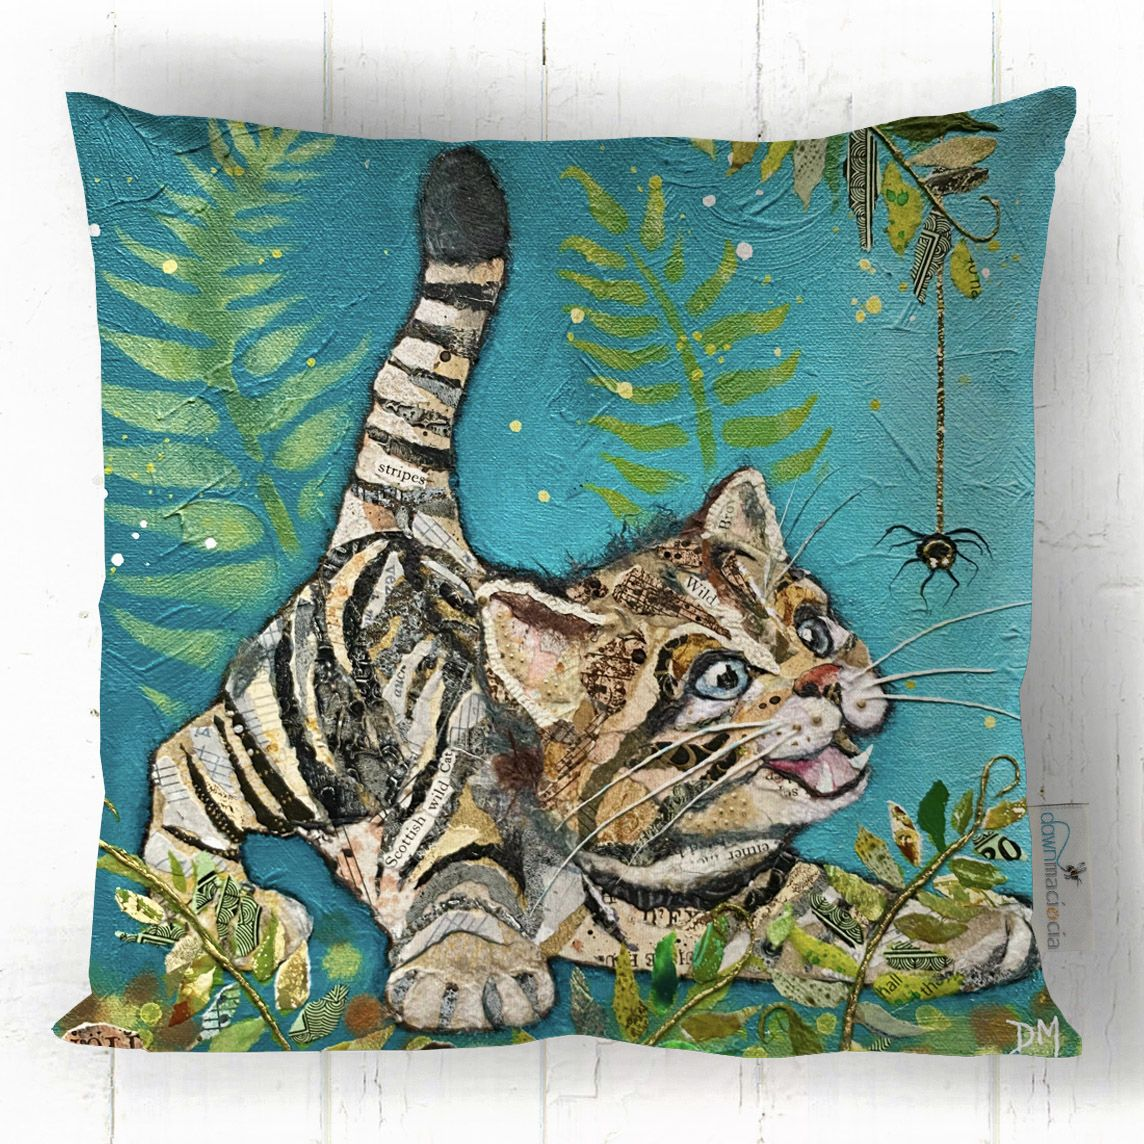 Wild Cat Kttien Cushion Handmade in UK by Dawn Maciocia